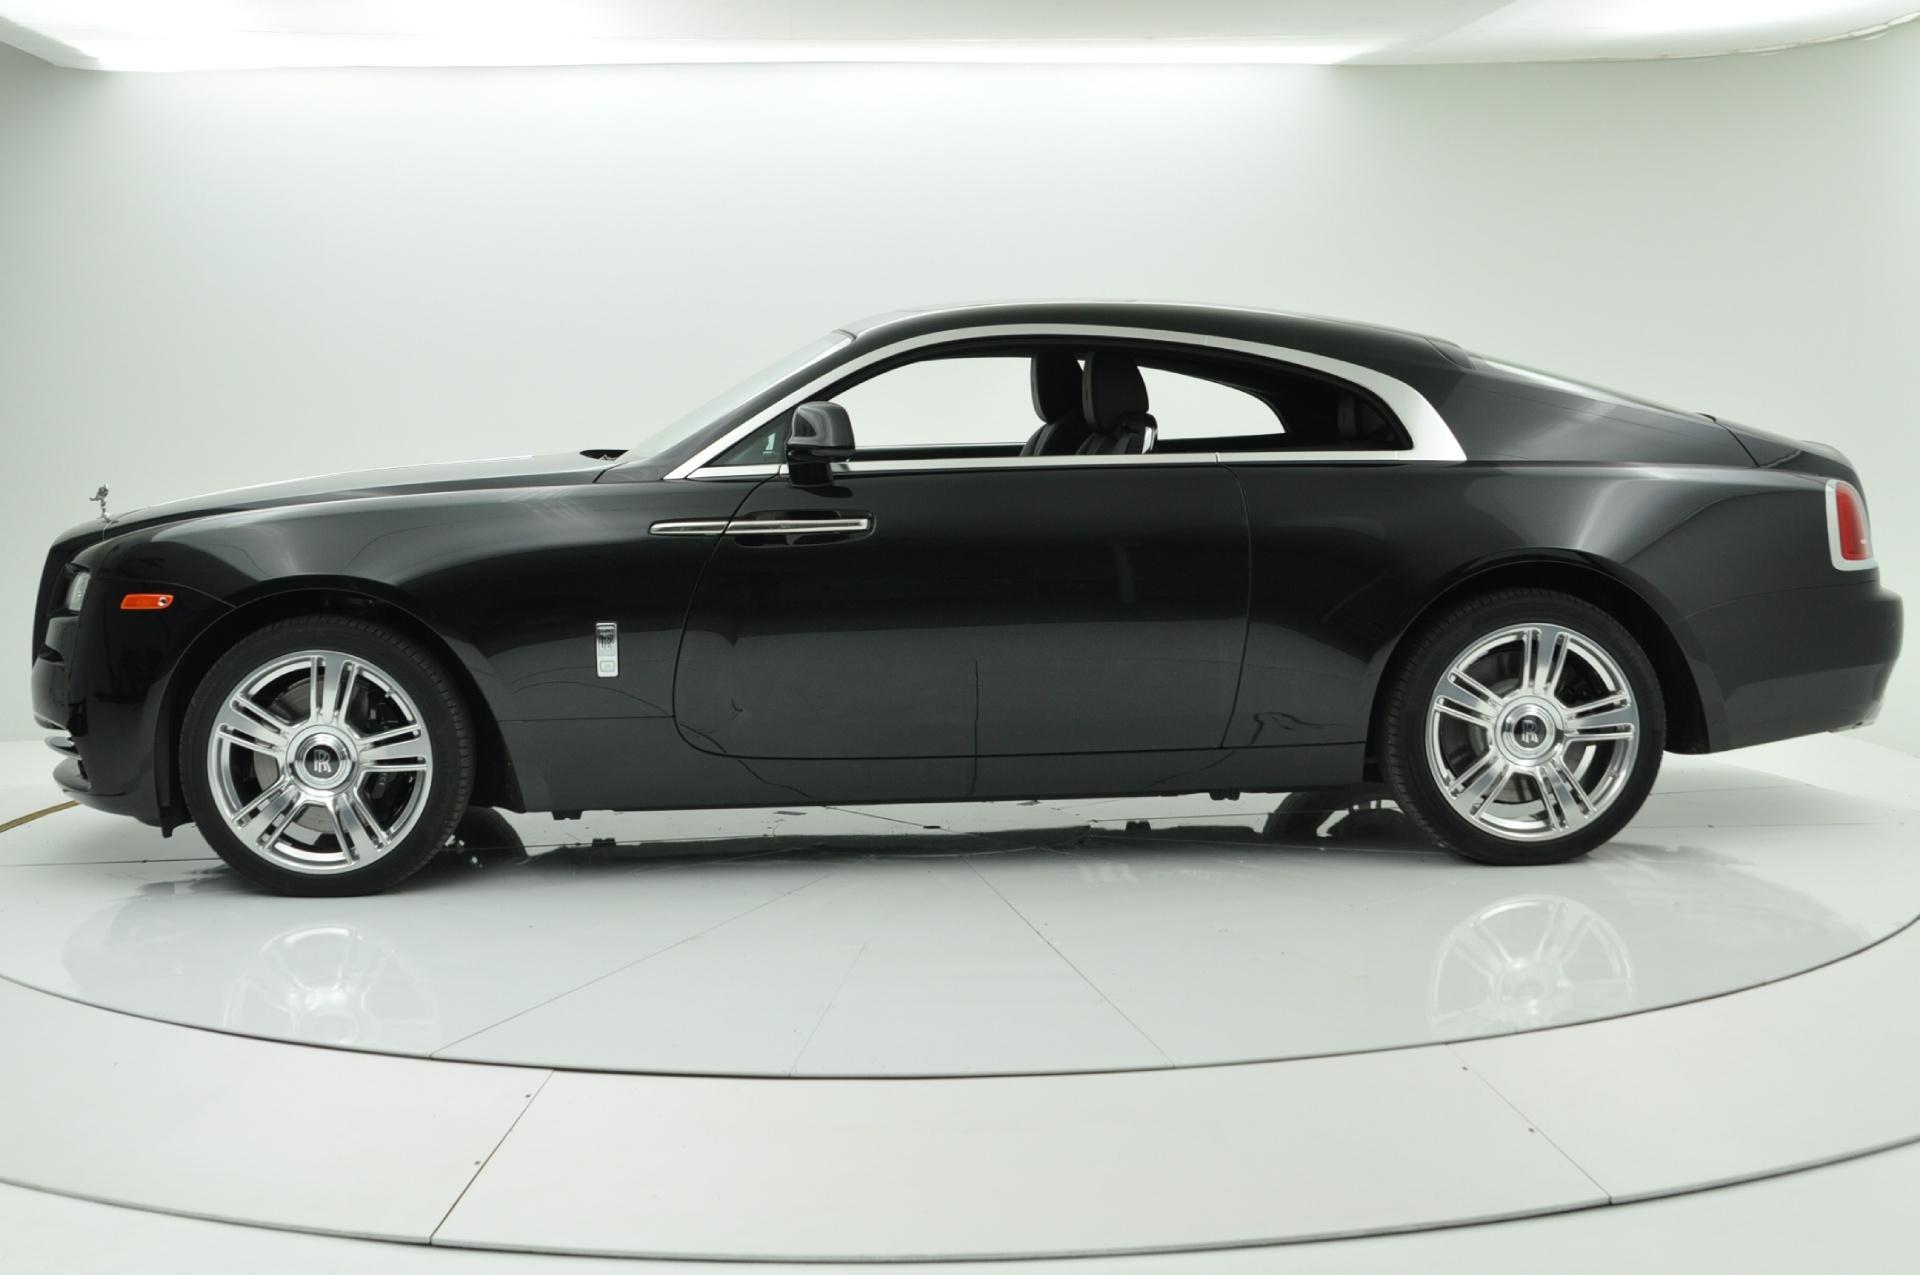 Rolls Royce Wraith For Sale >> Used 2015 Rolls Royce Wraith For Sale 239 880 F C